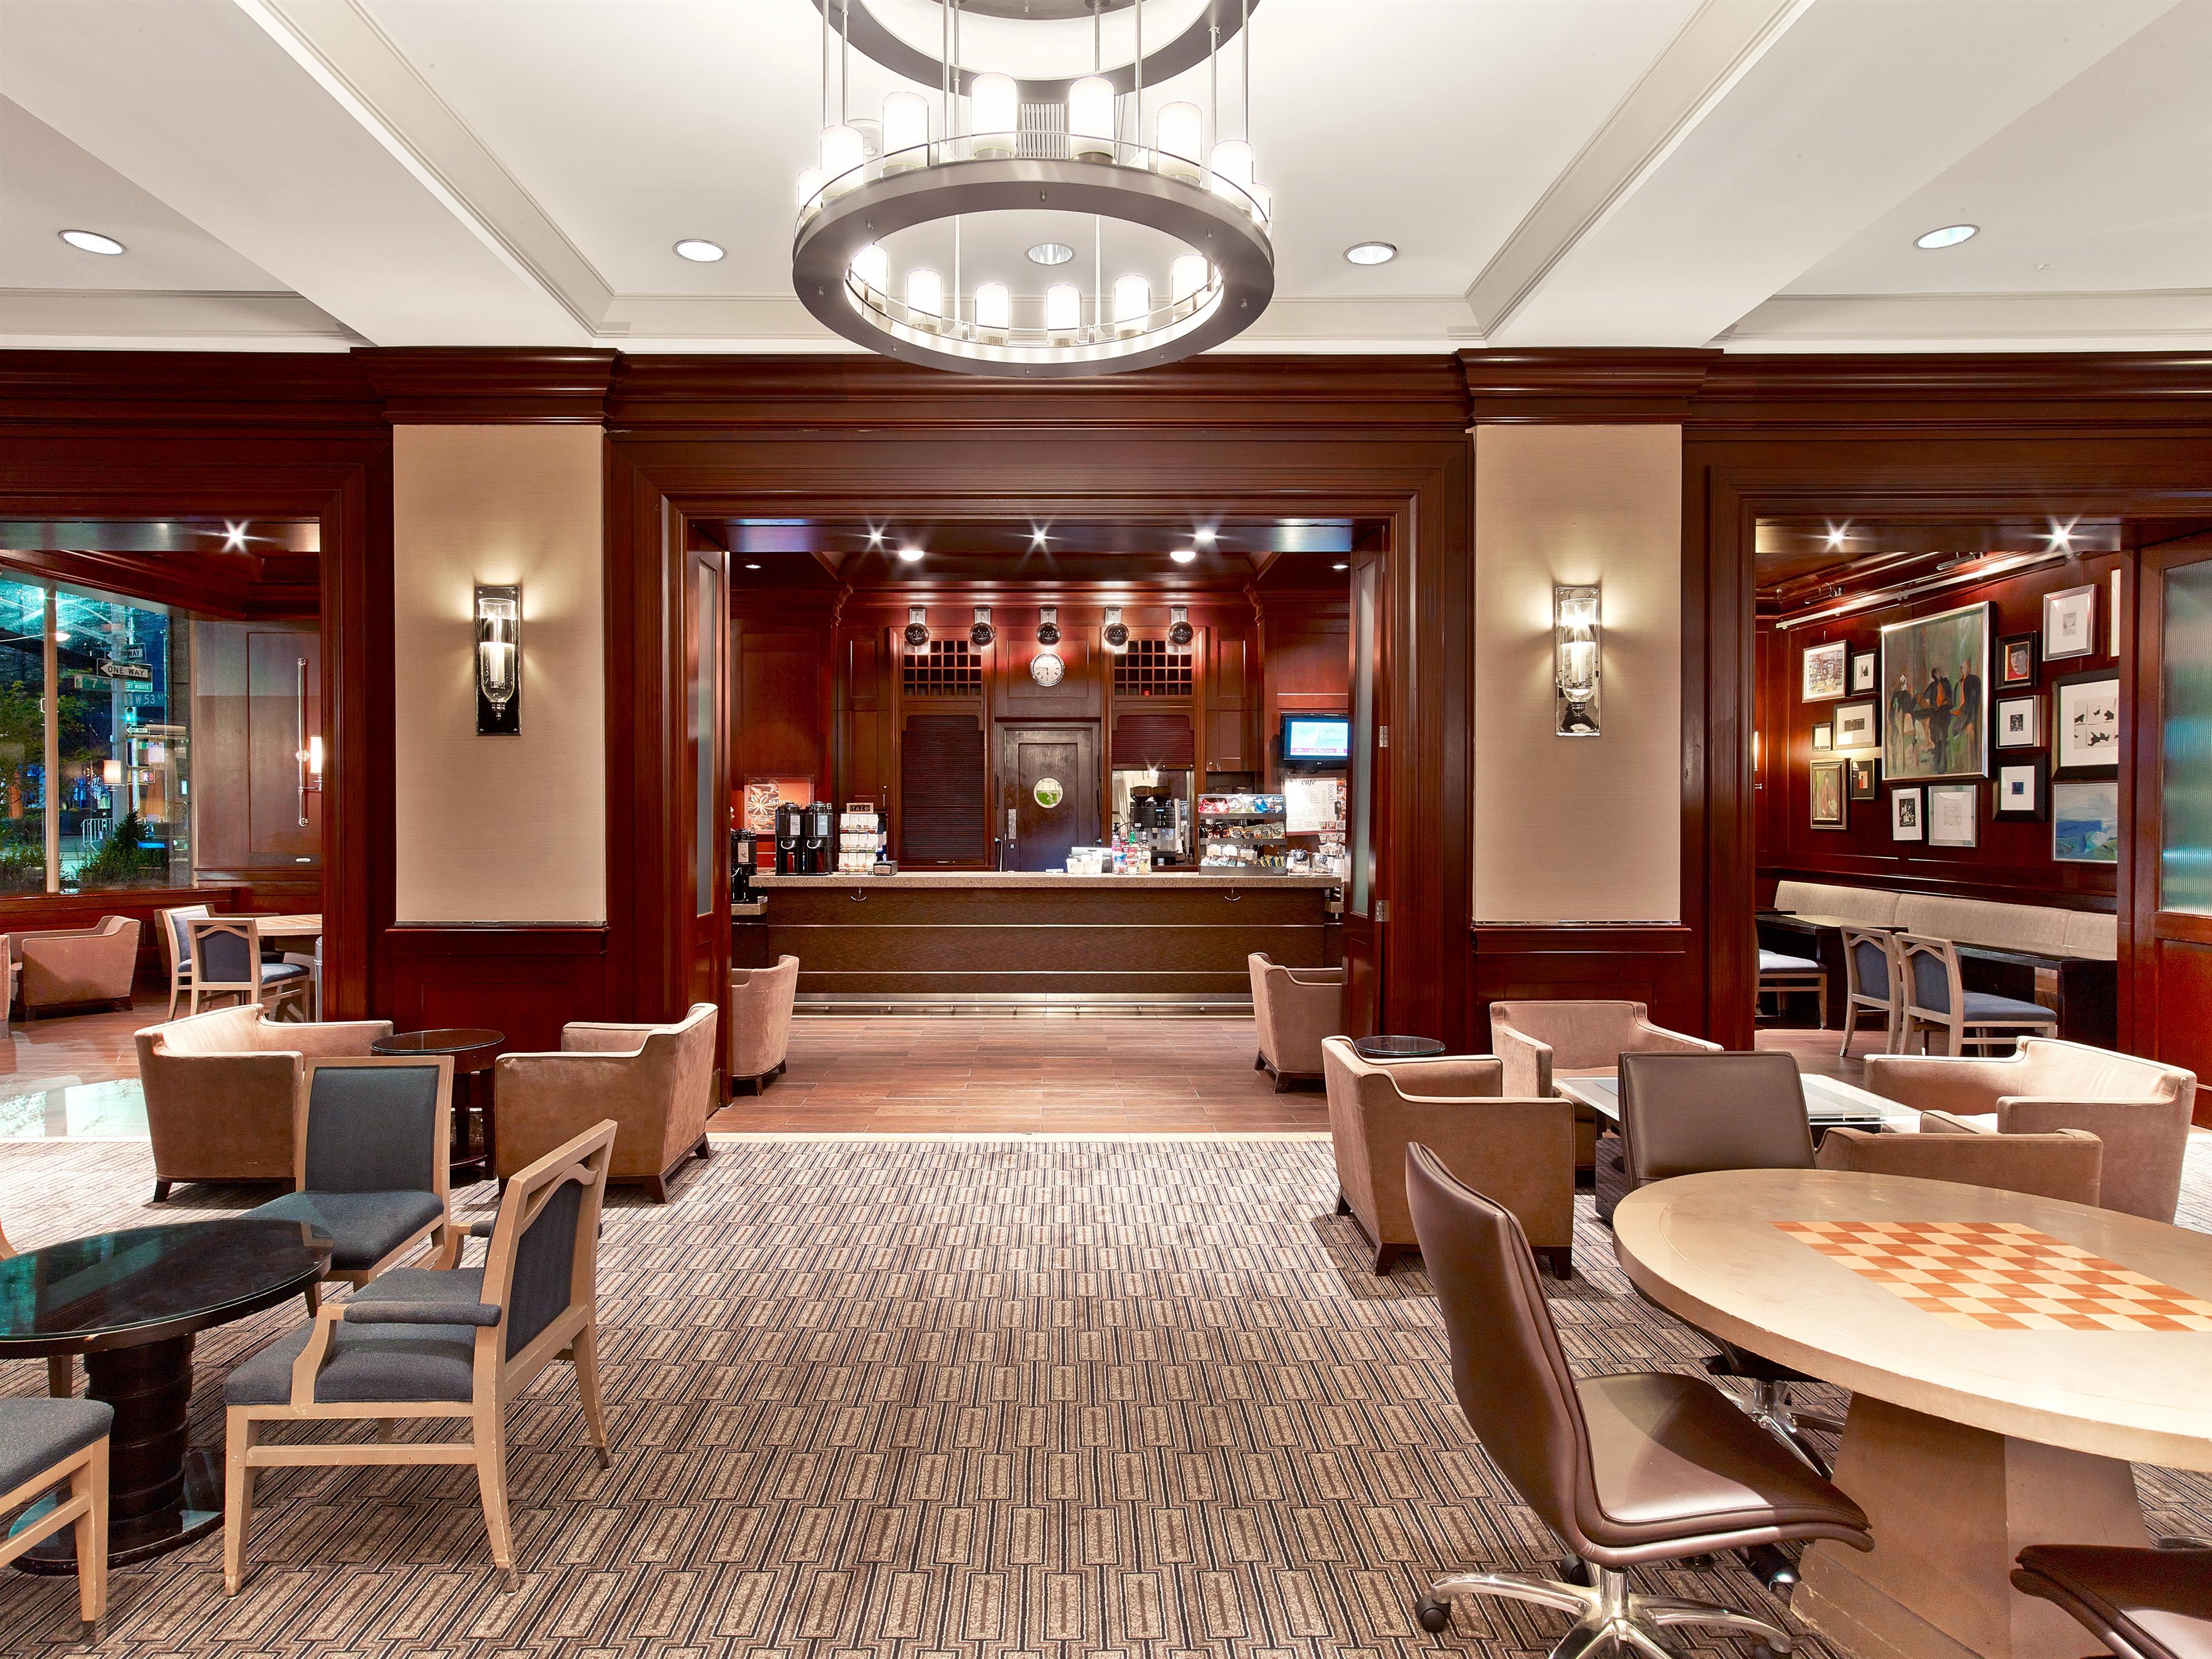 Sheraton New York Times Square Hotel image 48